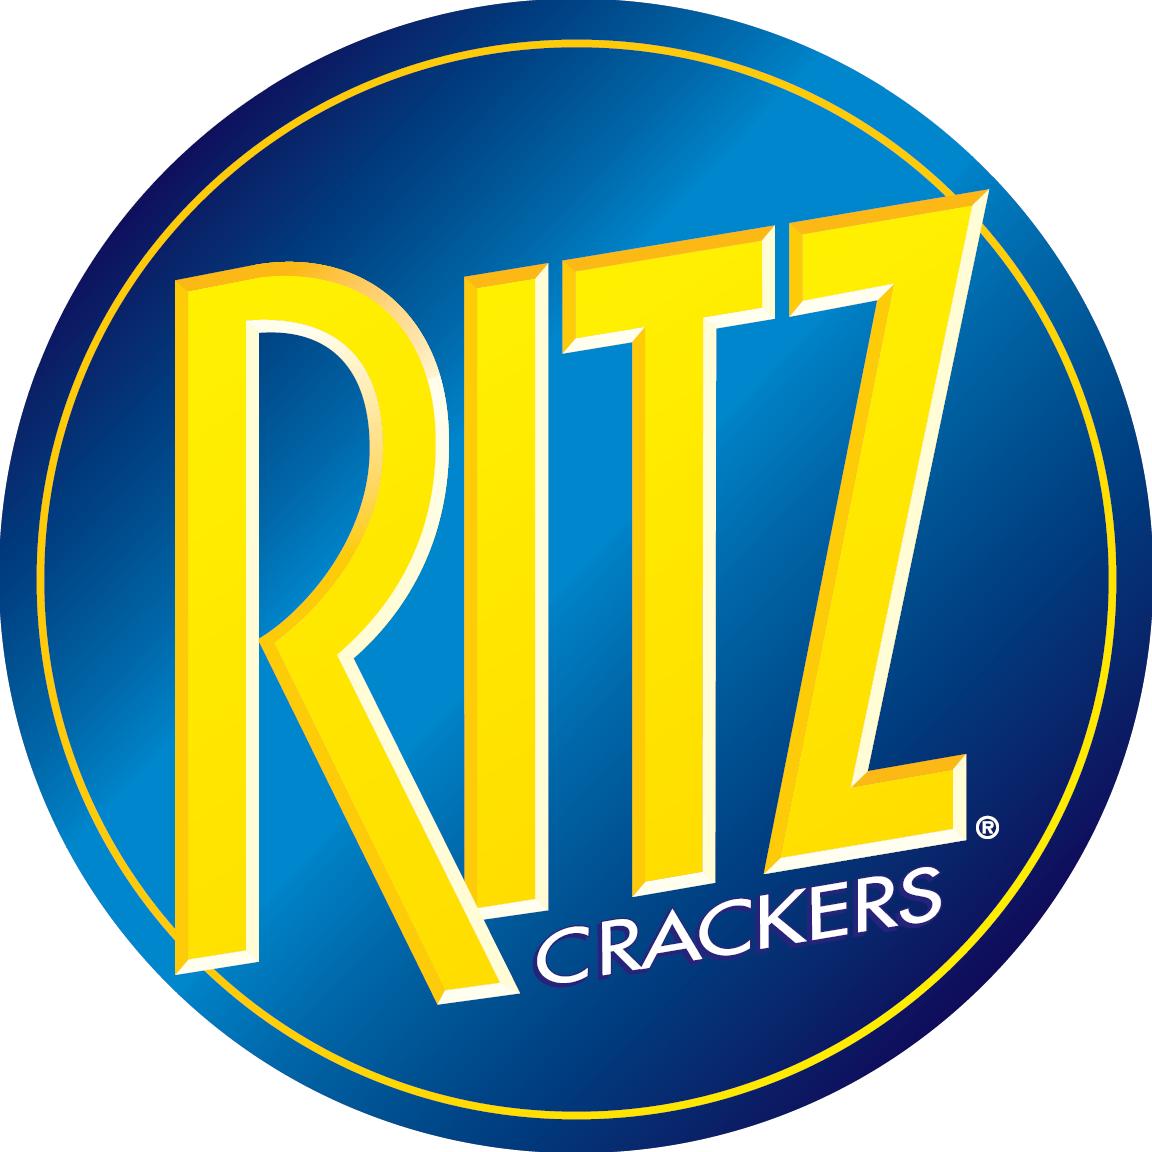 http://vignette1.wikia.nocookie.net/logopedia/images/7/70/Ritz_logo.png/revision/latest?cb=20100214172705